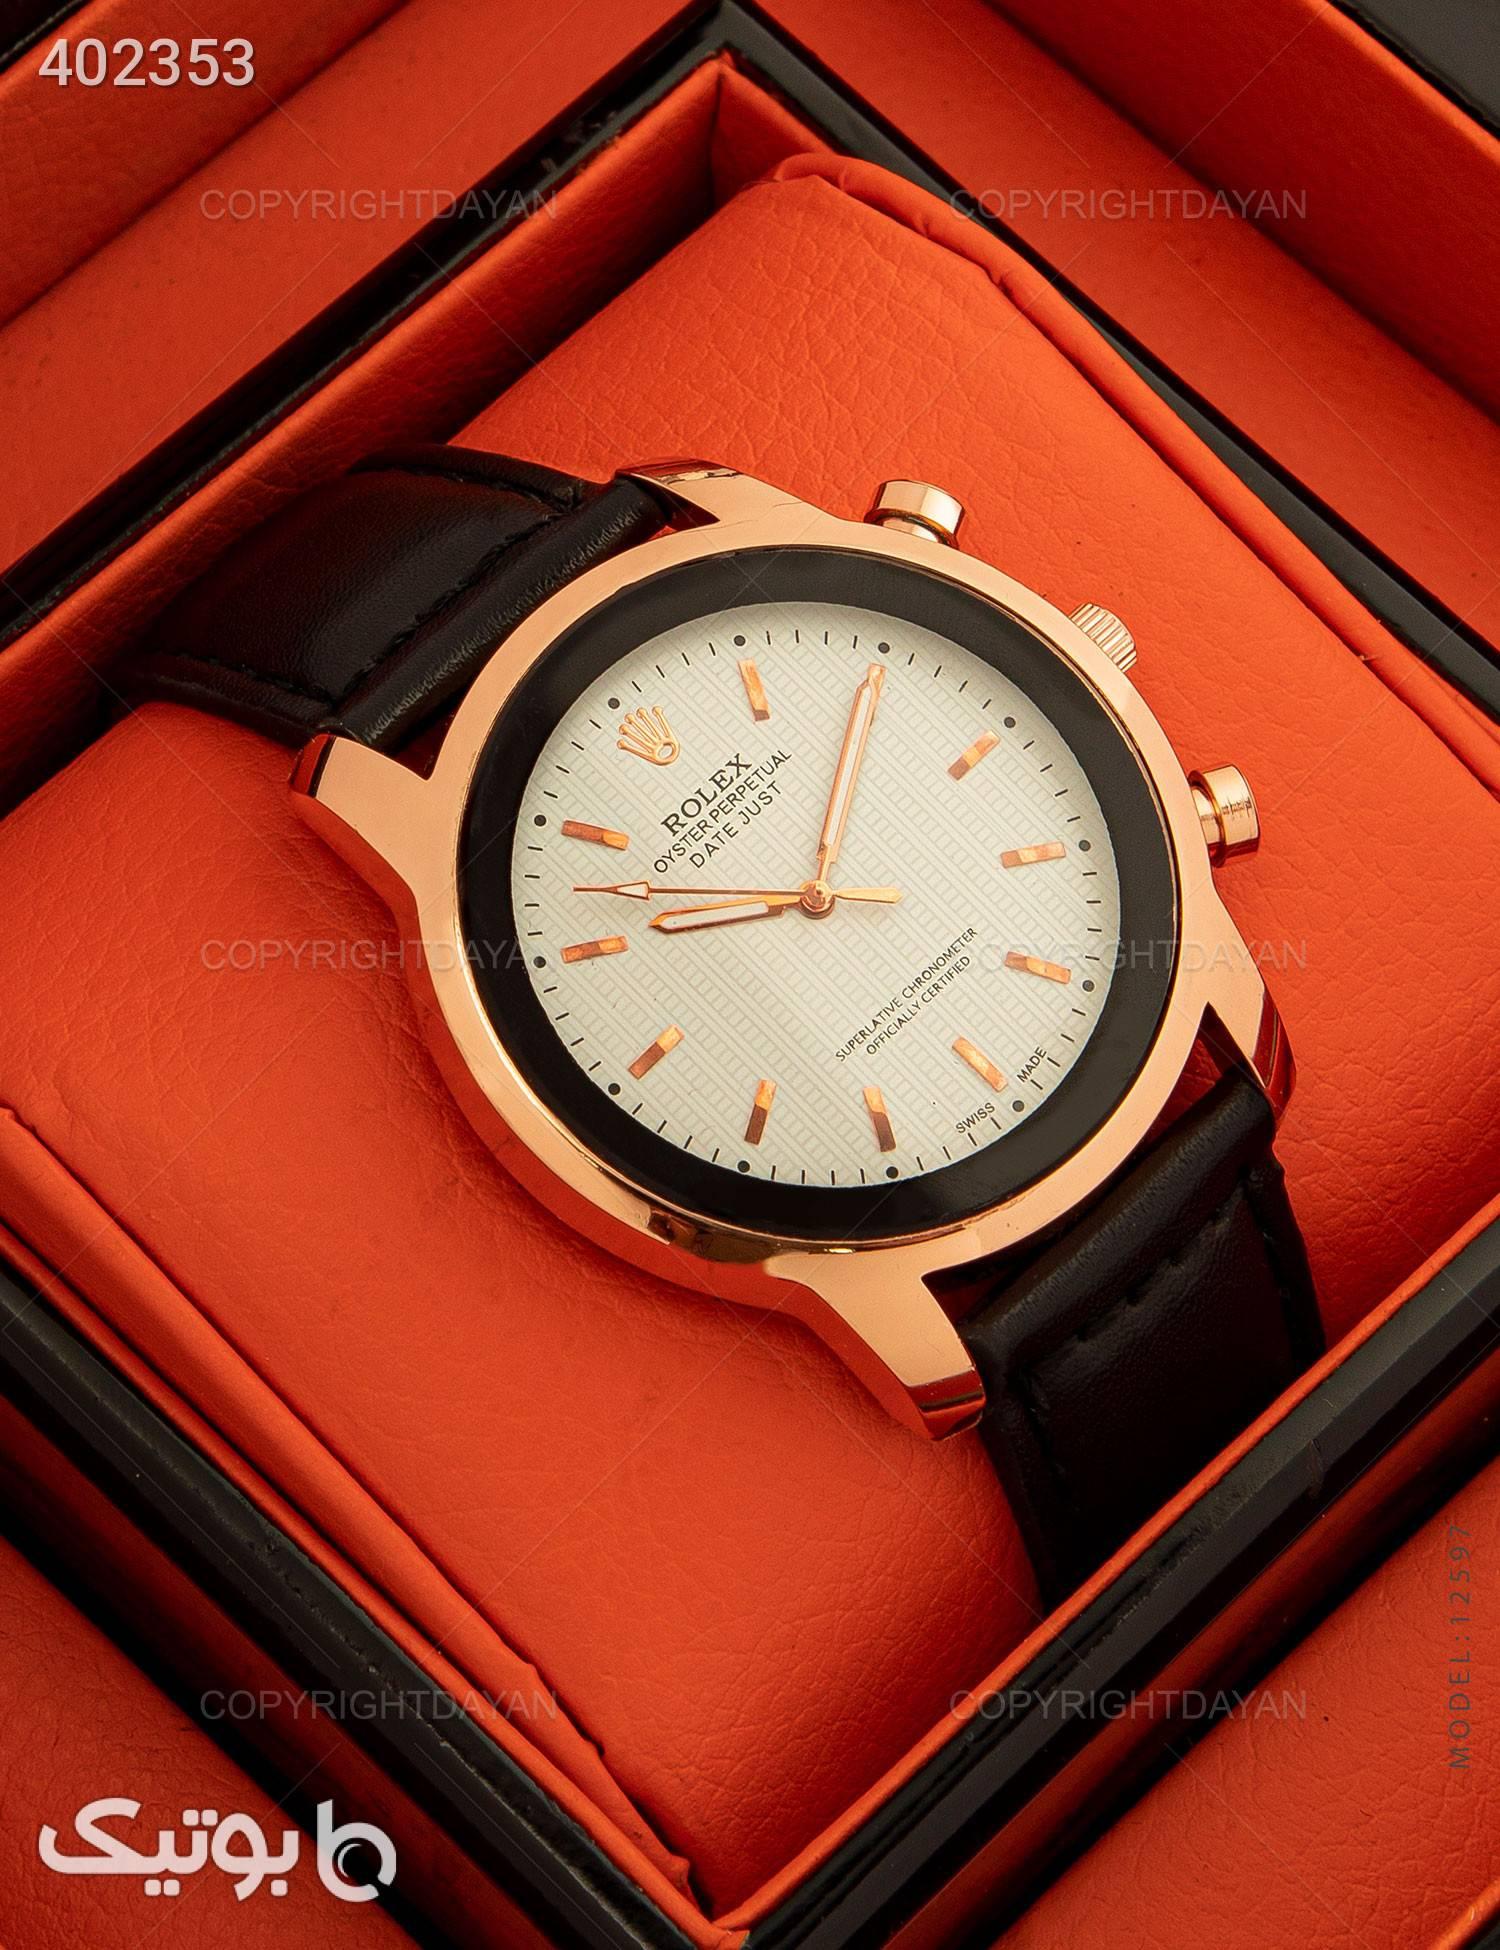 ساعت مچی Rolex مدل 12597 مشکی ساعت